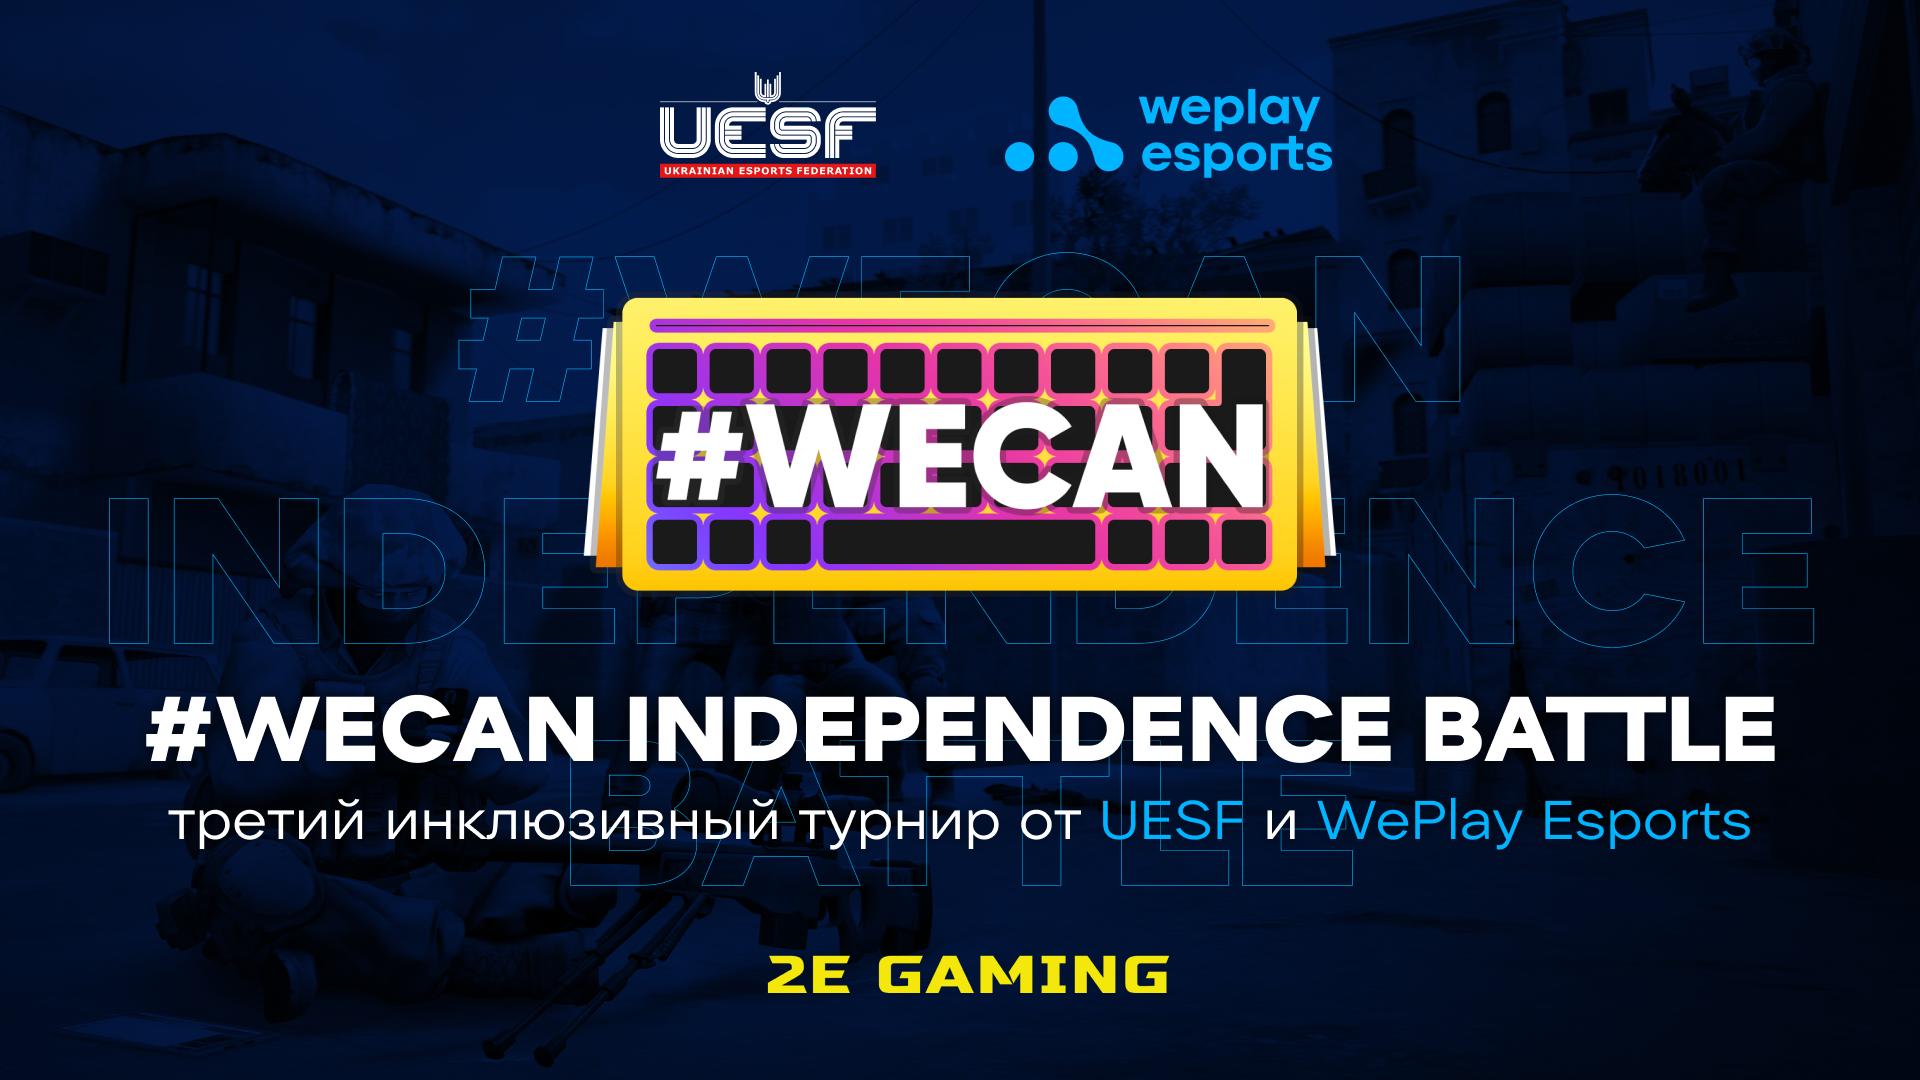 #WECAN Independence Battle – третий инклюзивный турнир от UESF и WePlay Esports. Изображение: WePlay Holding